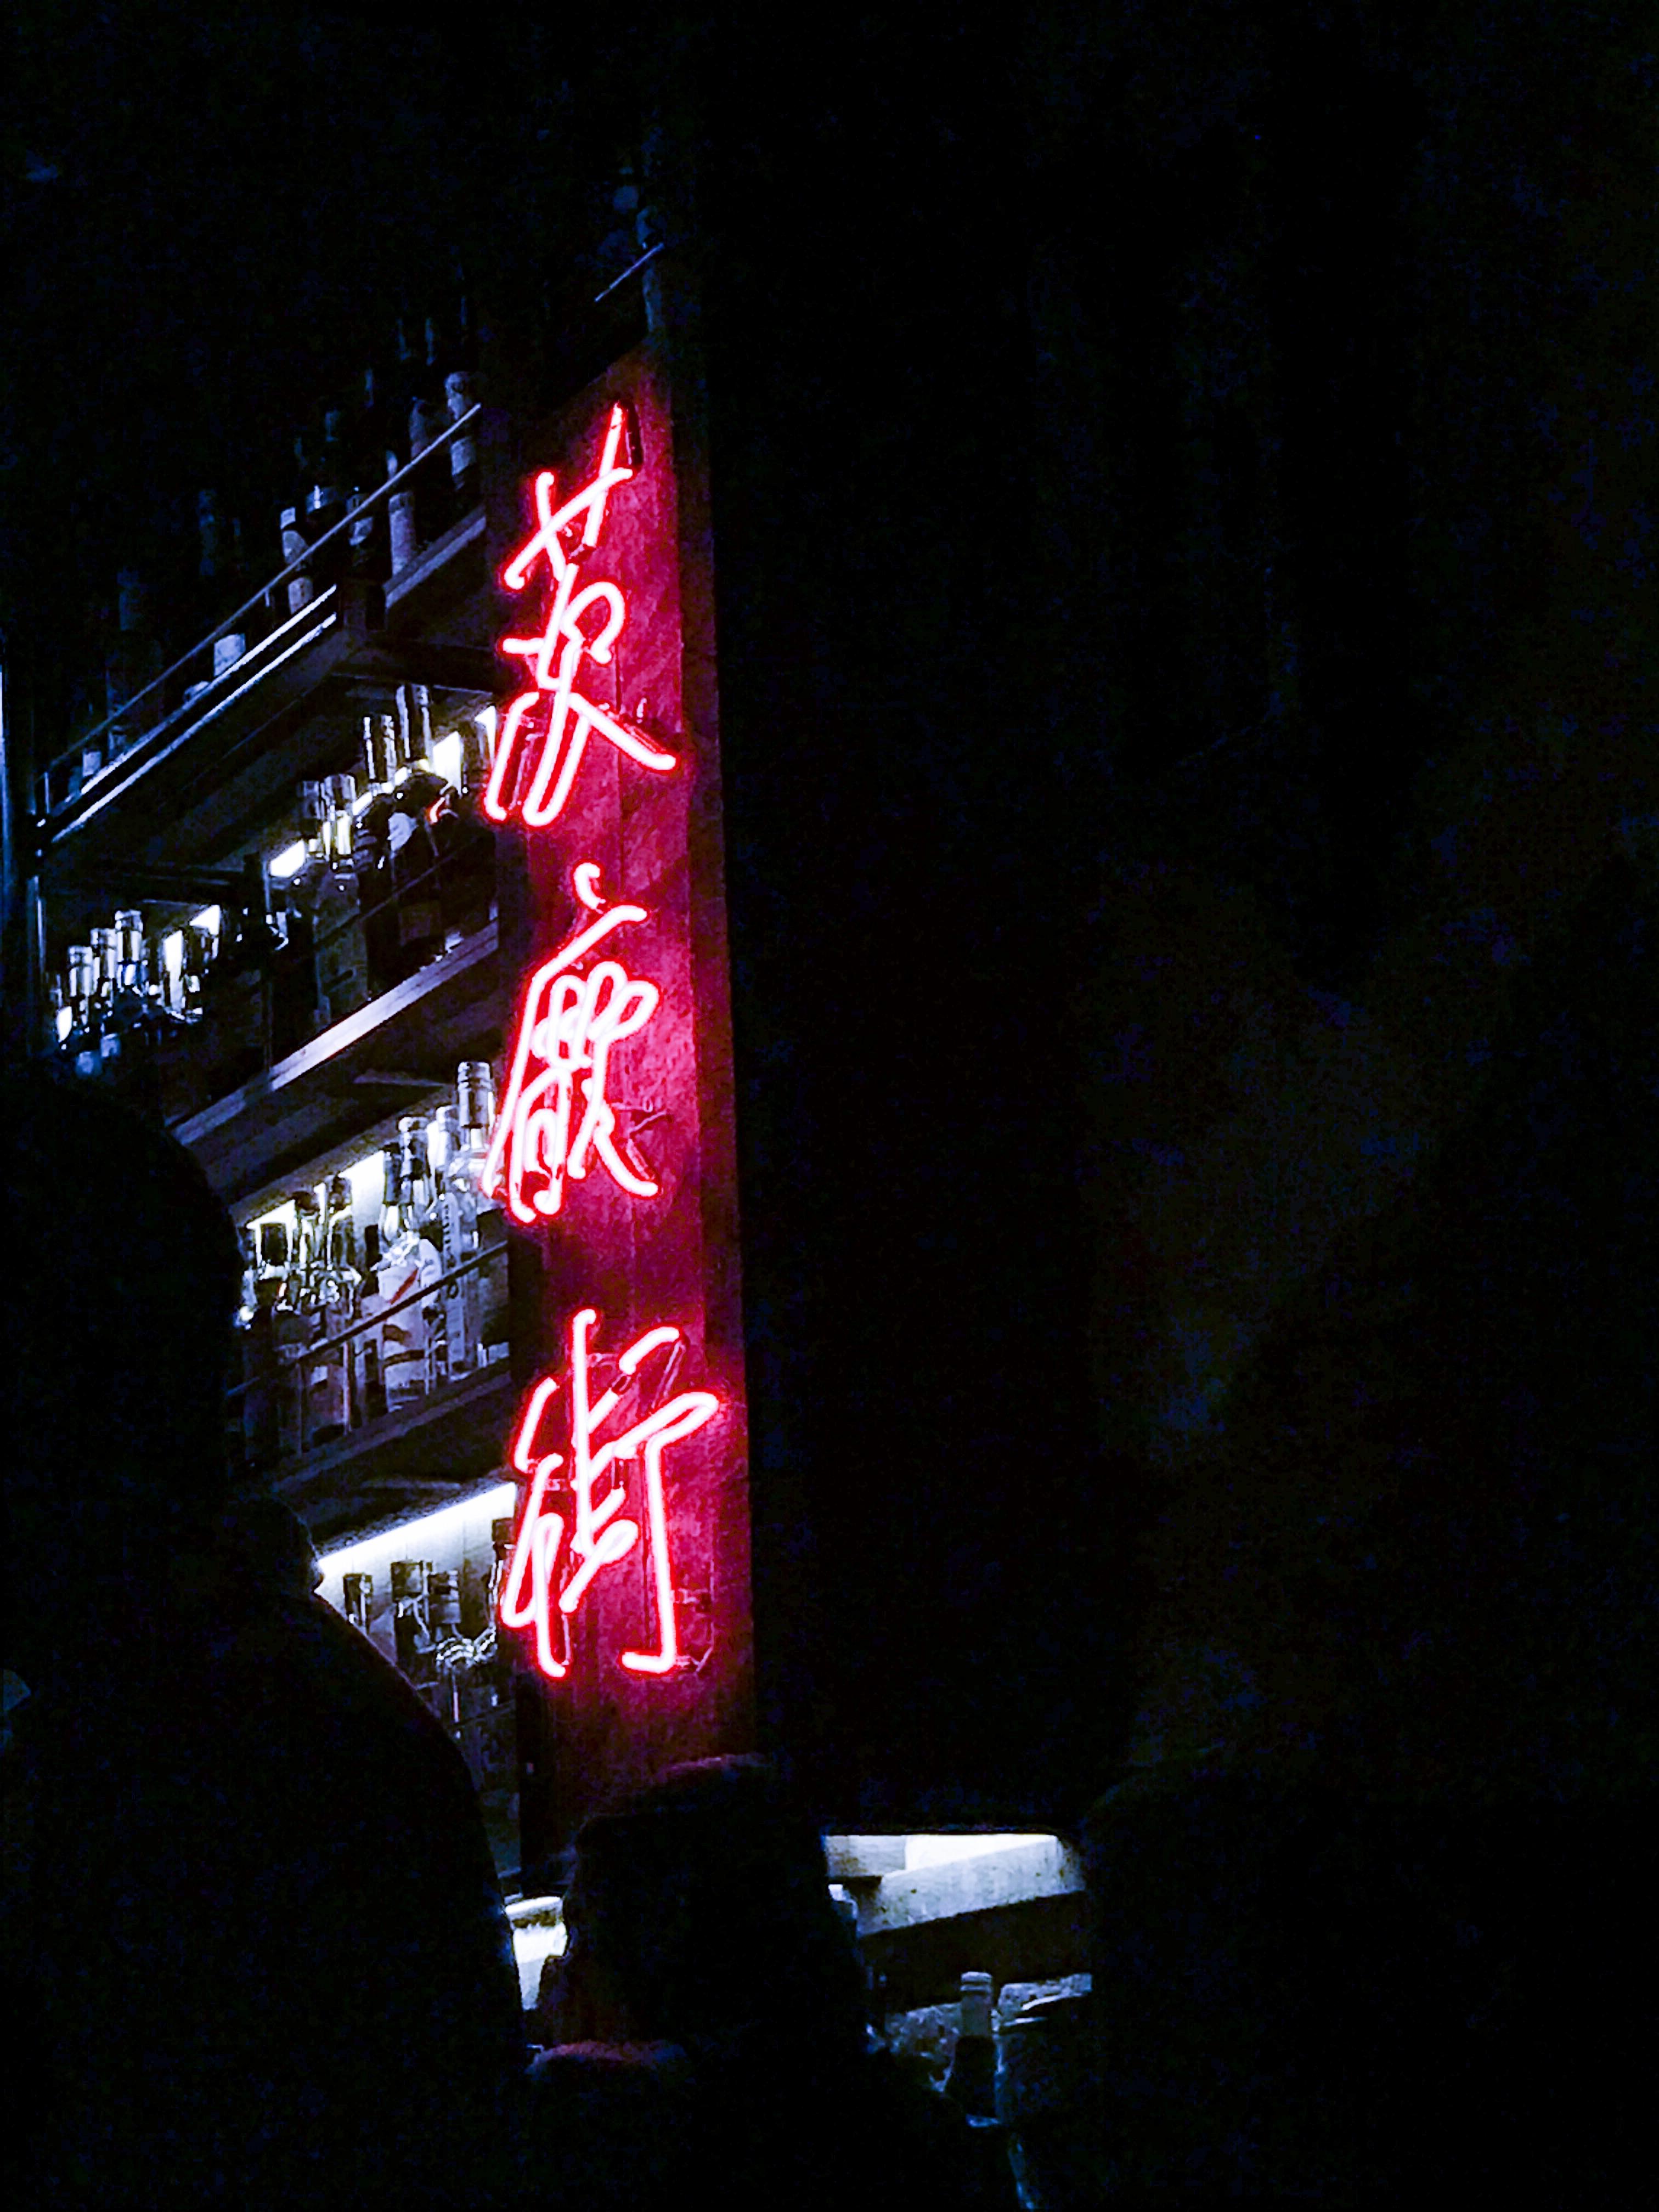 Speakeasy Neon Signage